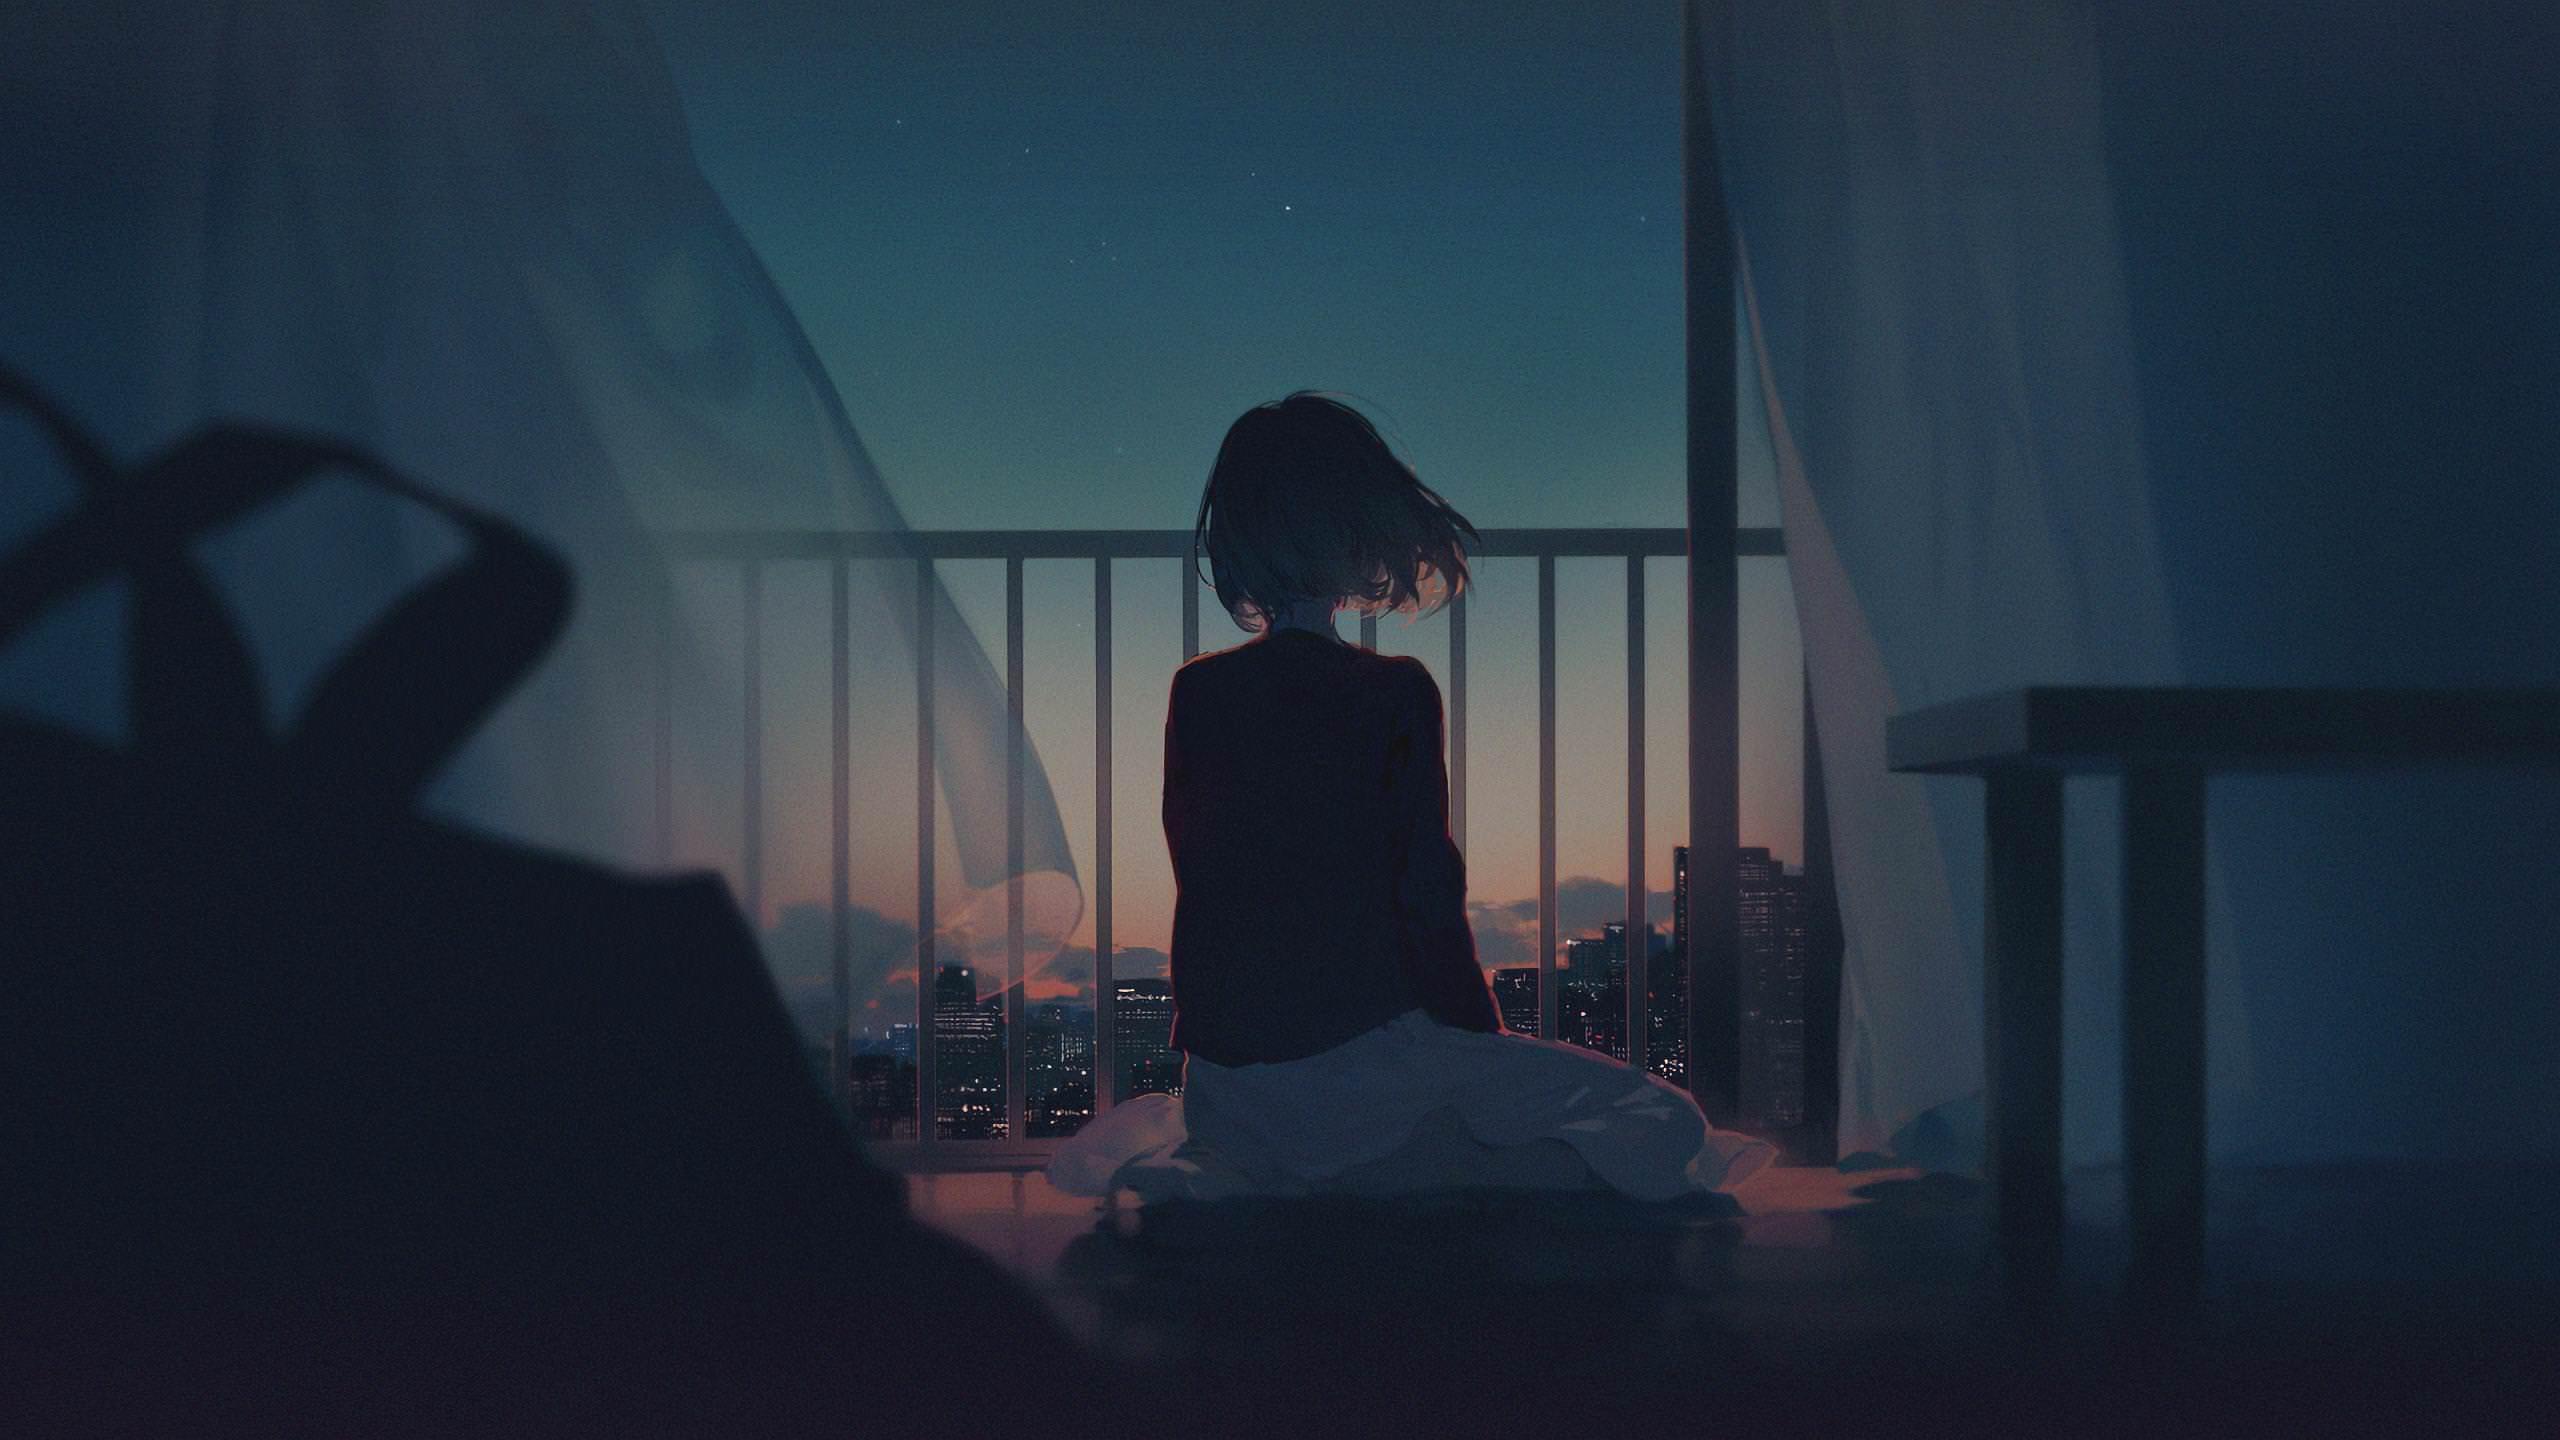 Alone Girl HD wallpaper